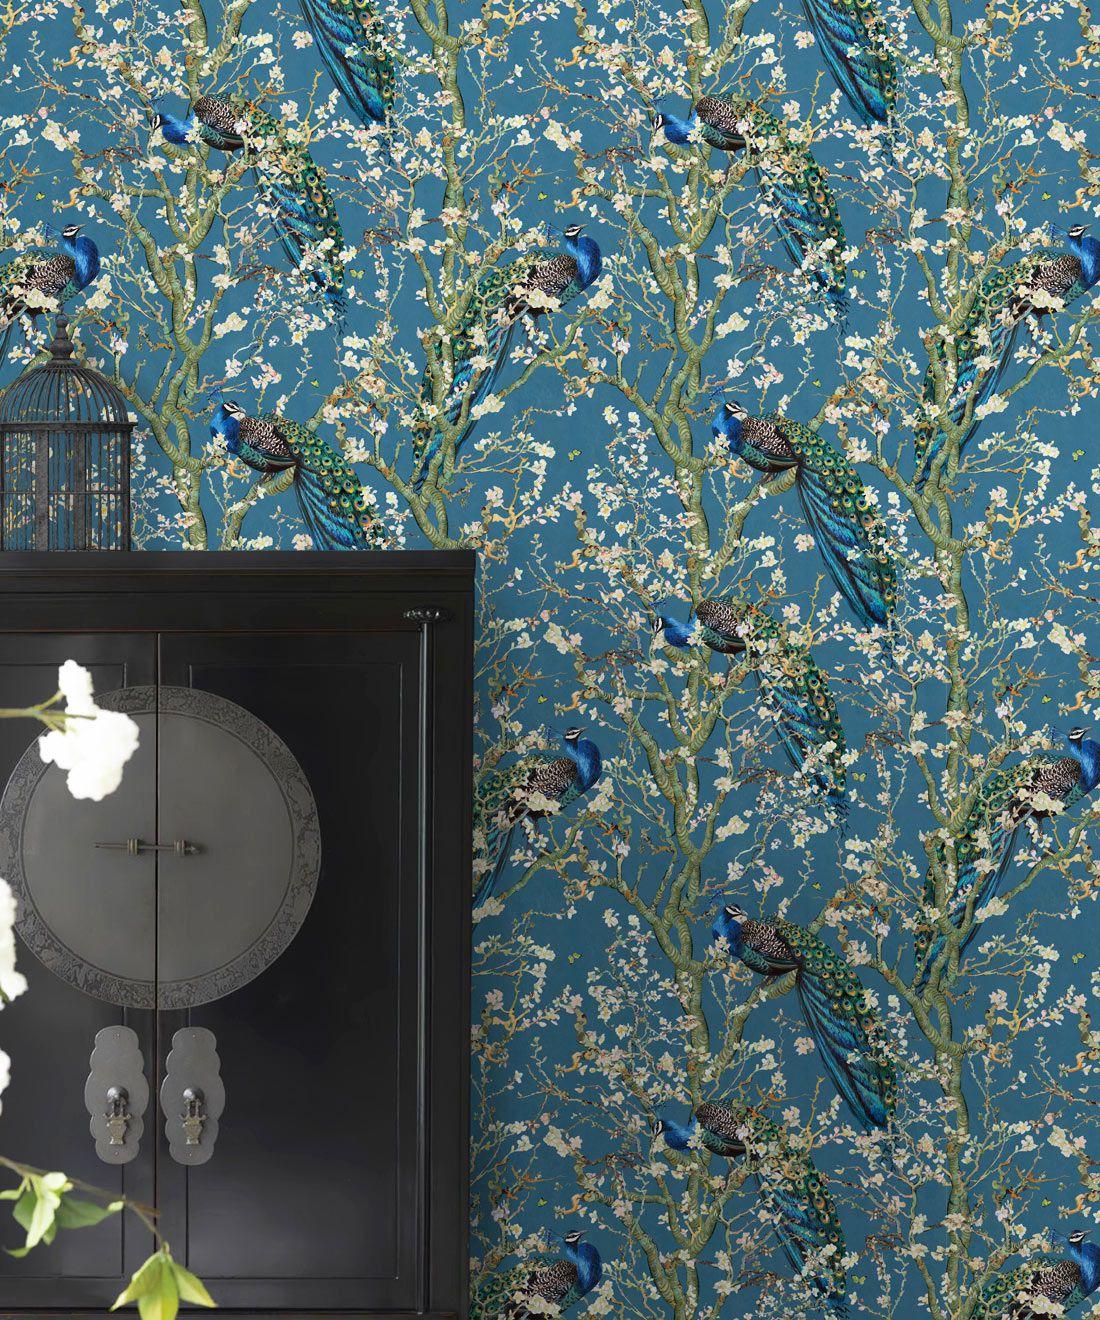 Almond Blossom Wallpaper • Chinoiserie Wallpaper • Wallpaper with Peacocks • Royal Blue Wallpaper •Insitu